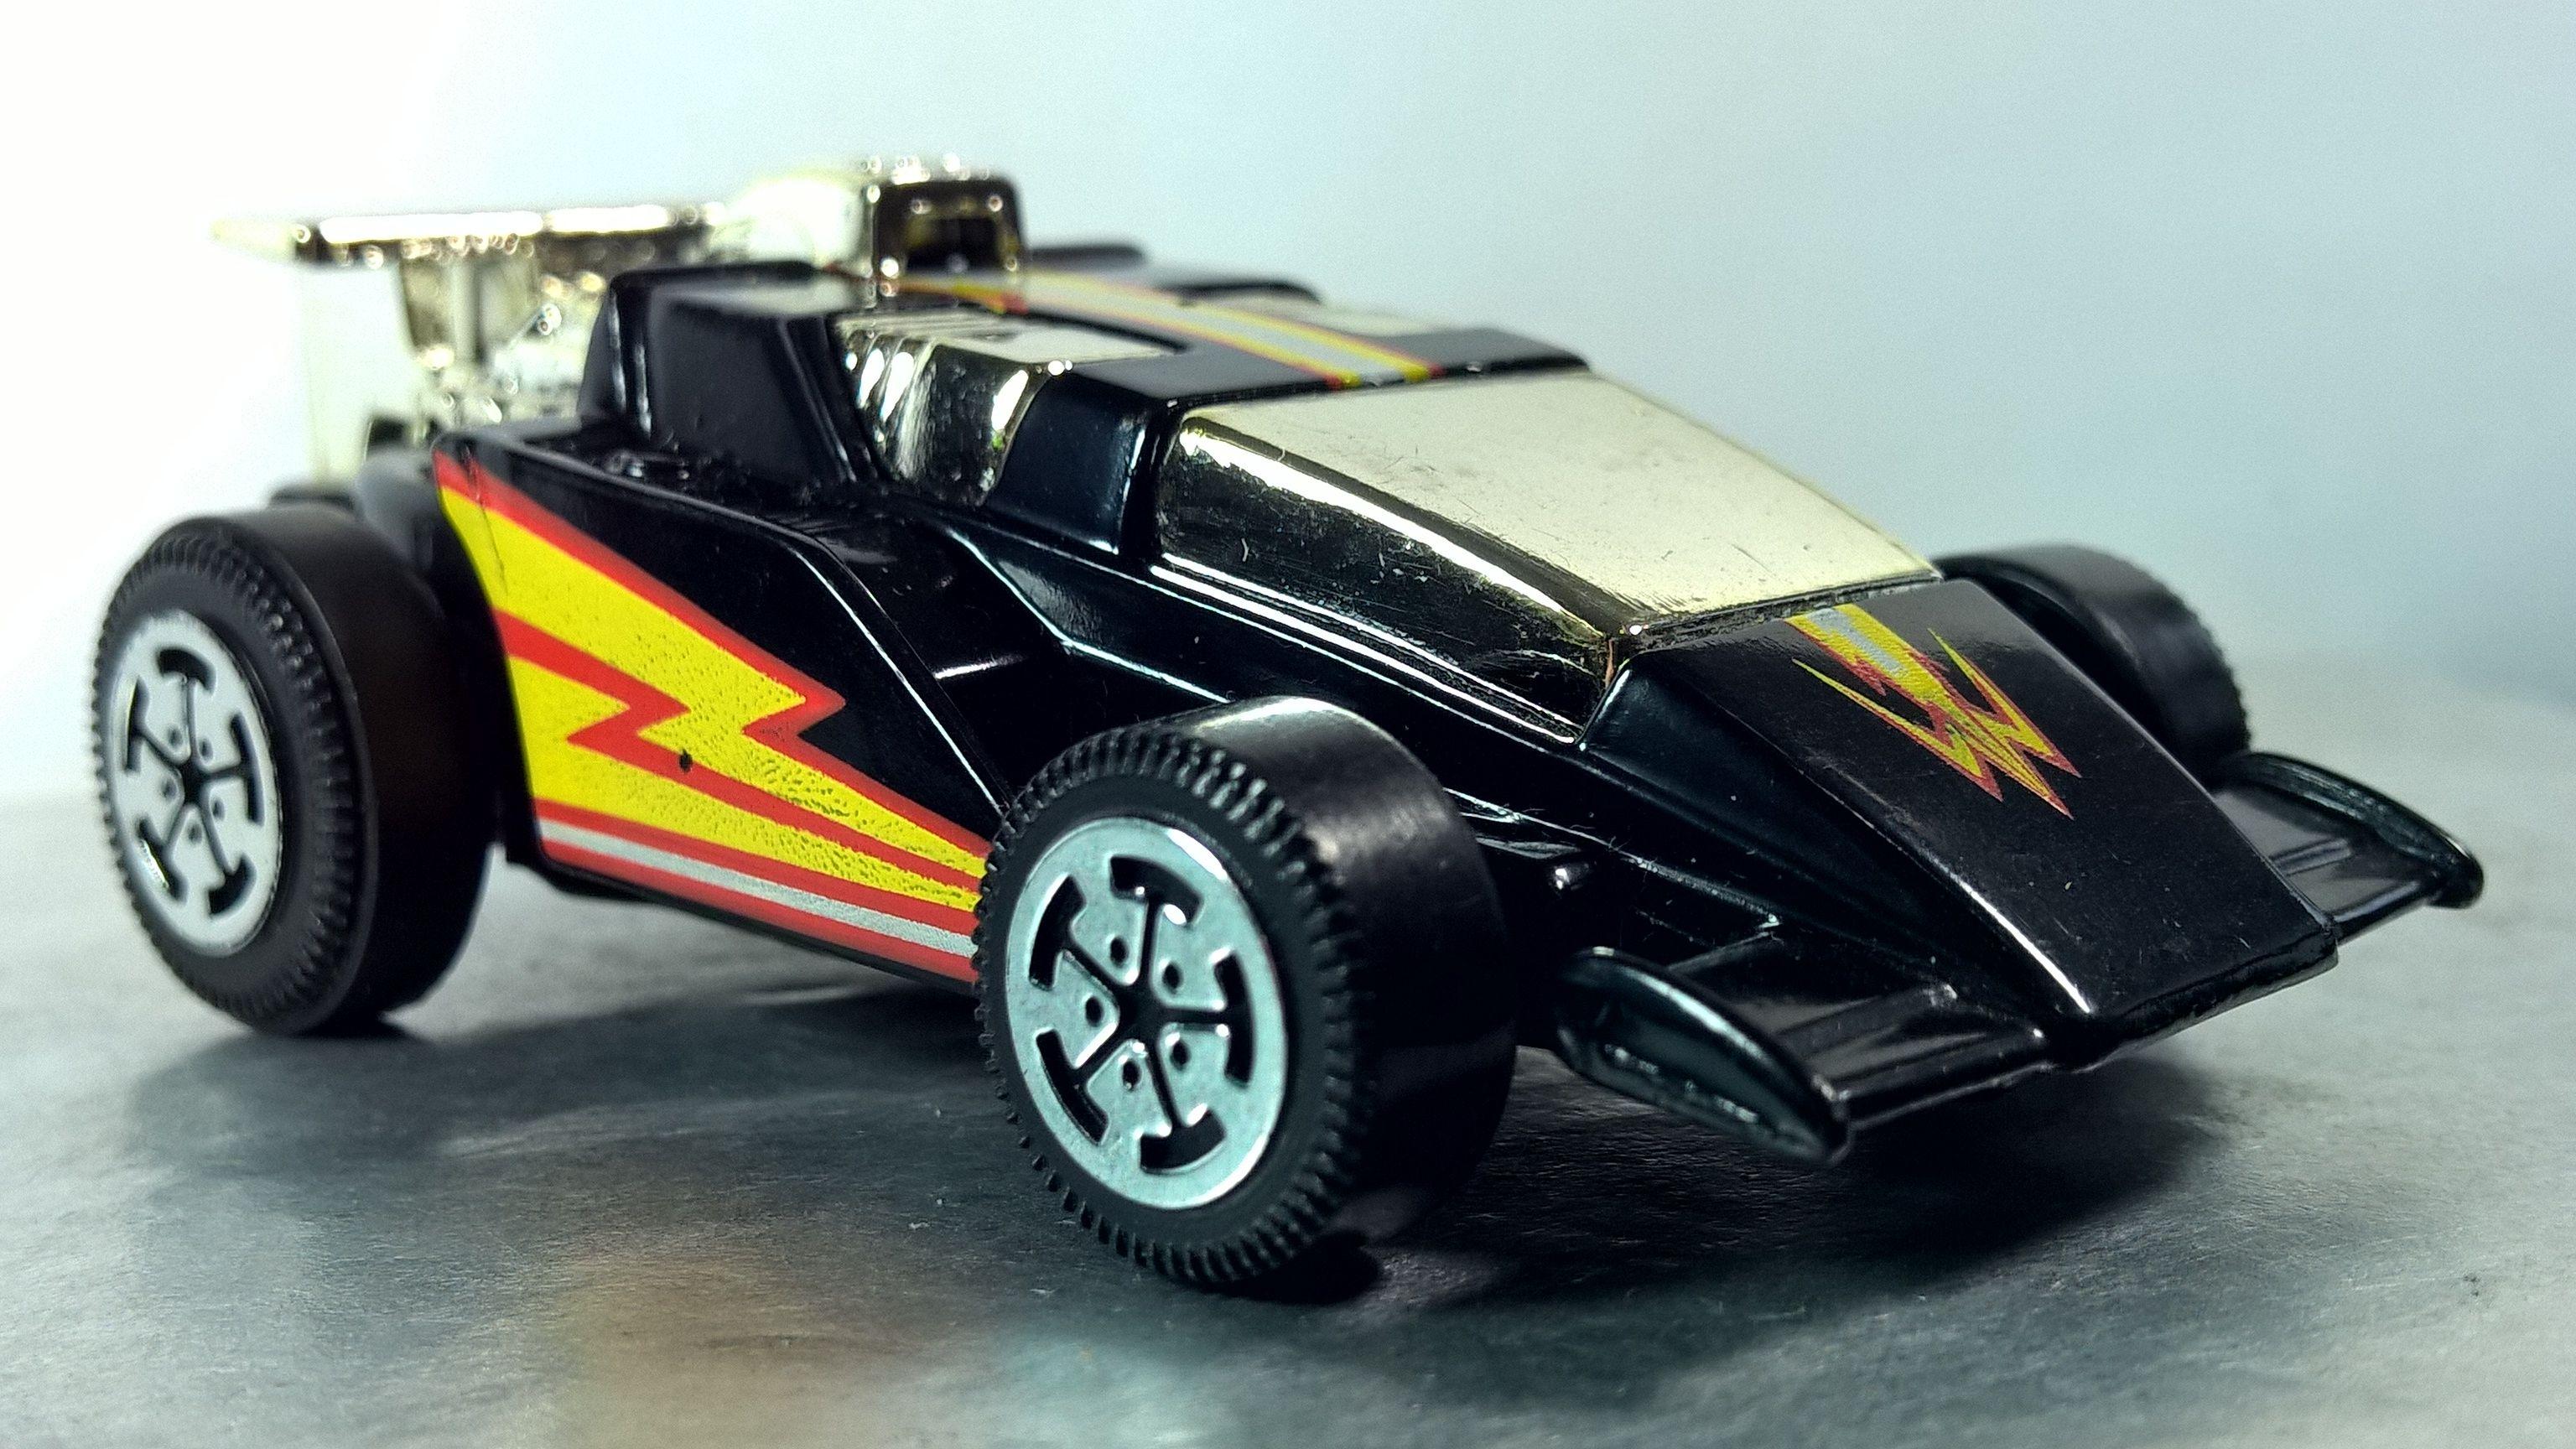 XV RACERS 1985 17 Hot wheels, Hot, Car photos